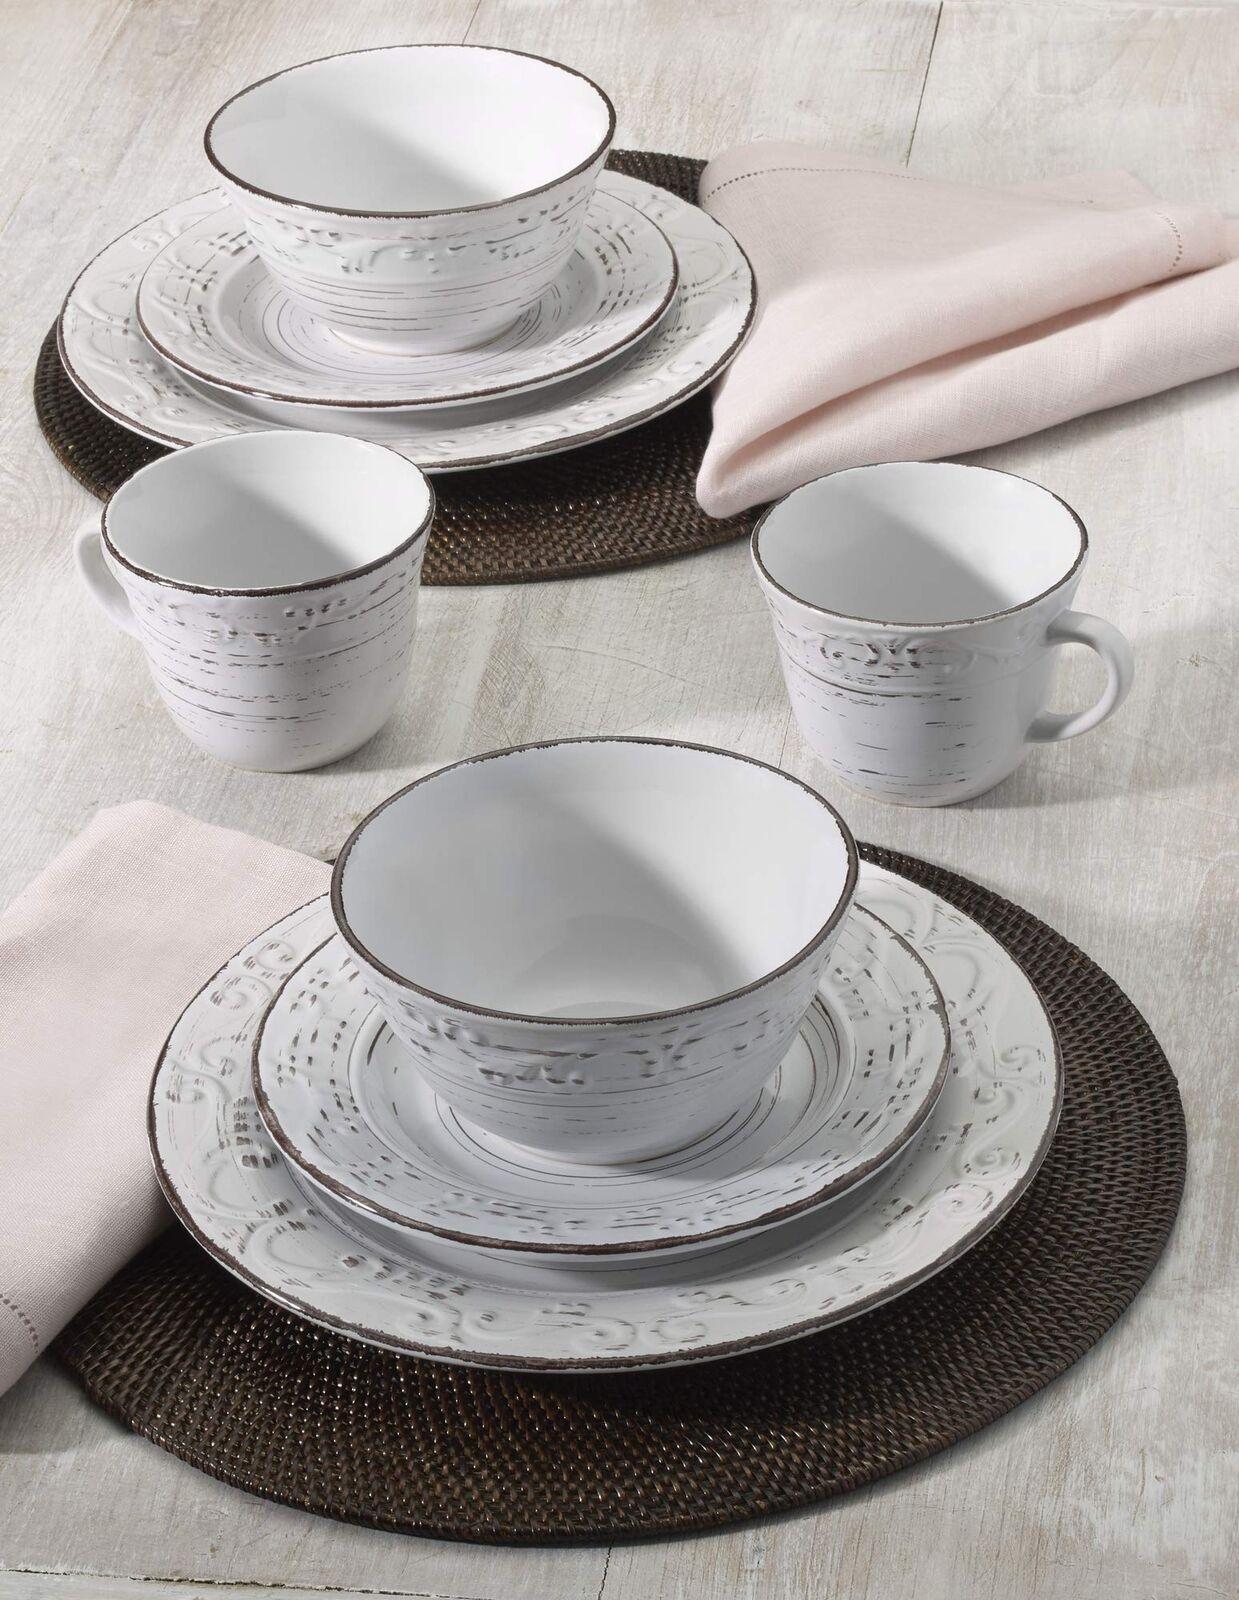 Plate Set Trellis White 16 Piece Dinnerware Set Service Design for 4 Brown Box